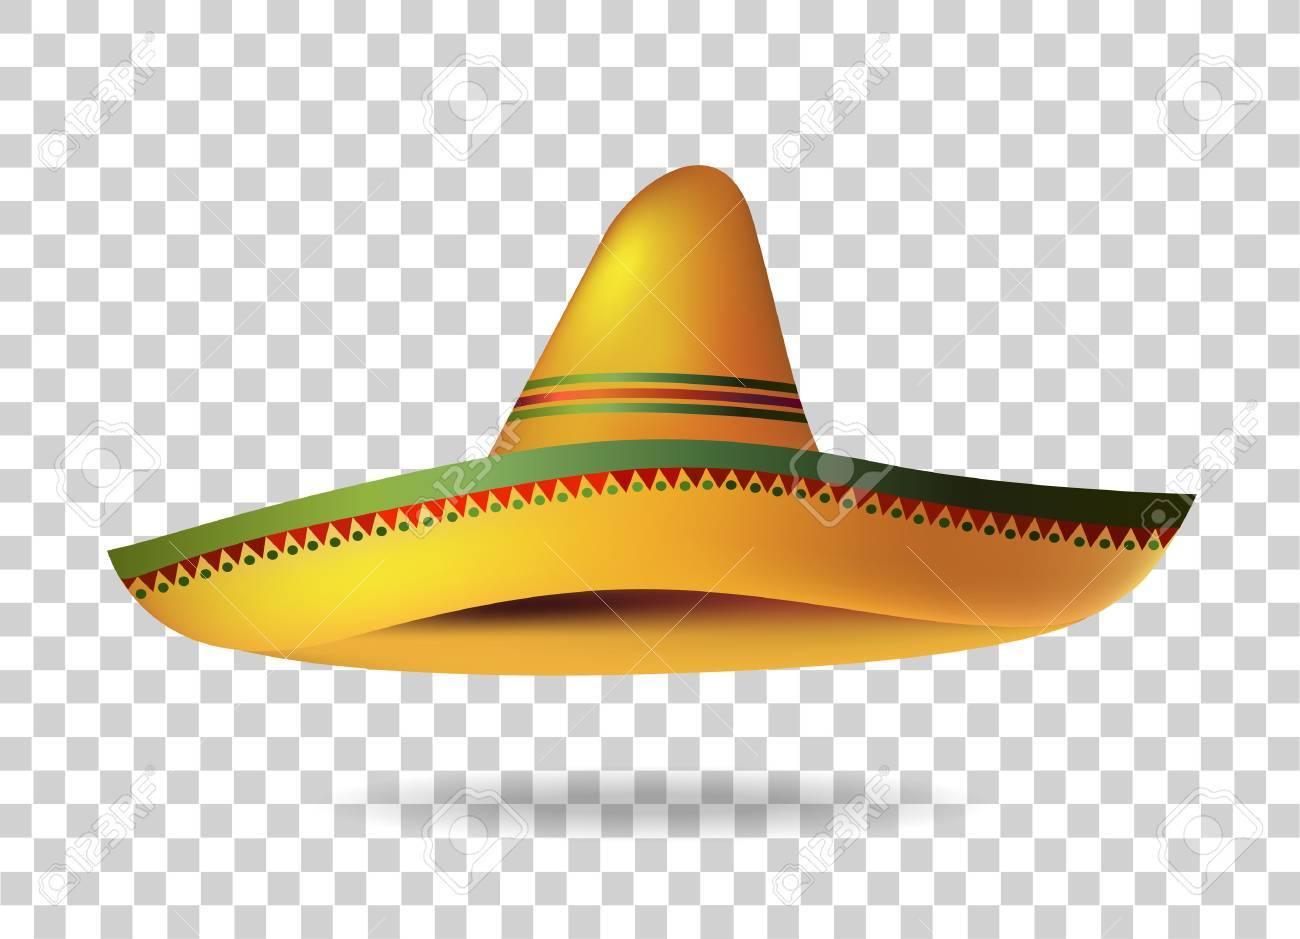 incomparable venta profesional para toda la familia Mexican Sombrero Hat transparent background. Mexico. Vector illustration